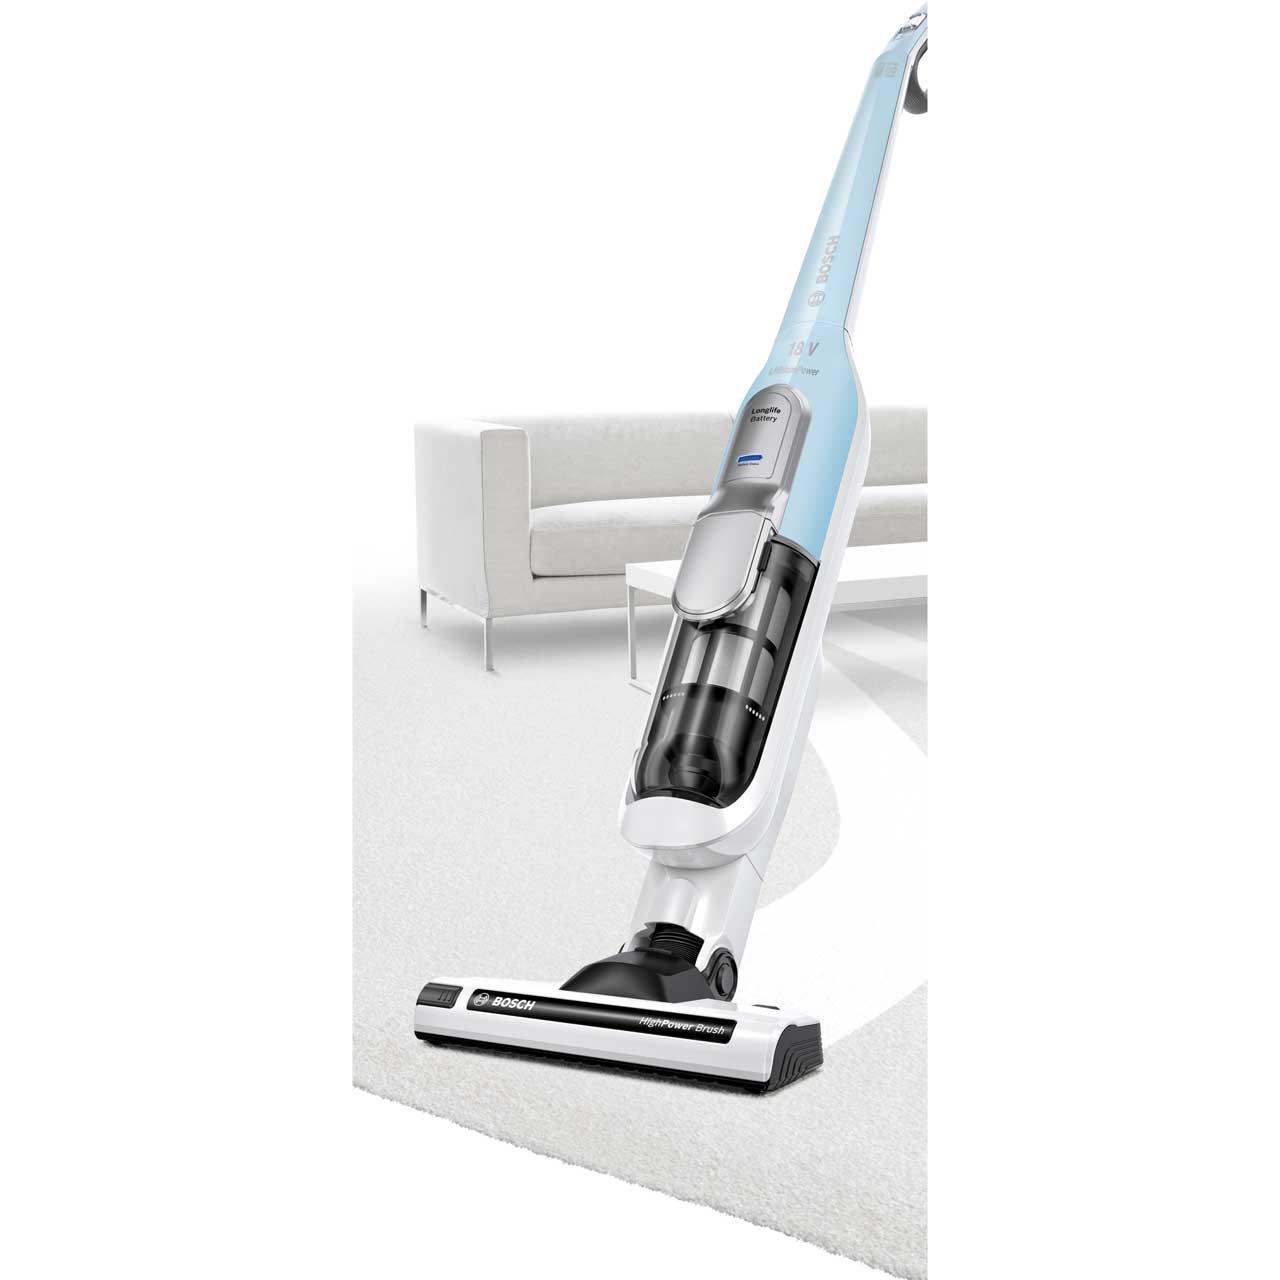 Bosch Bch51830gb Lithium Power Cordless Vacuum Cleaner 2